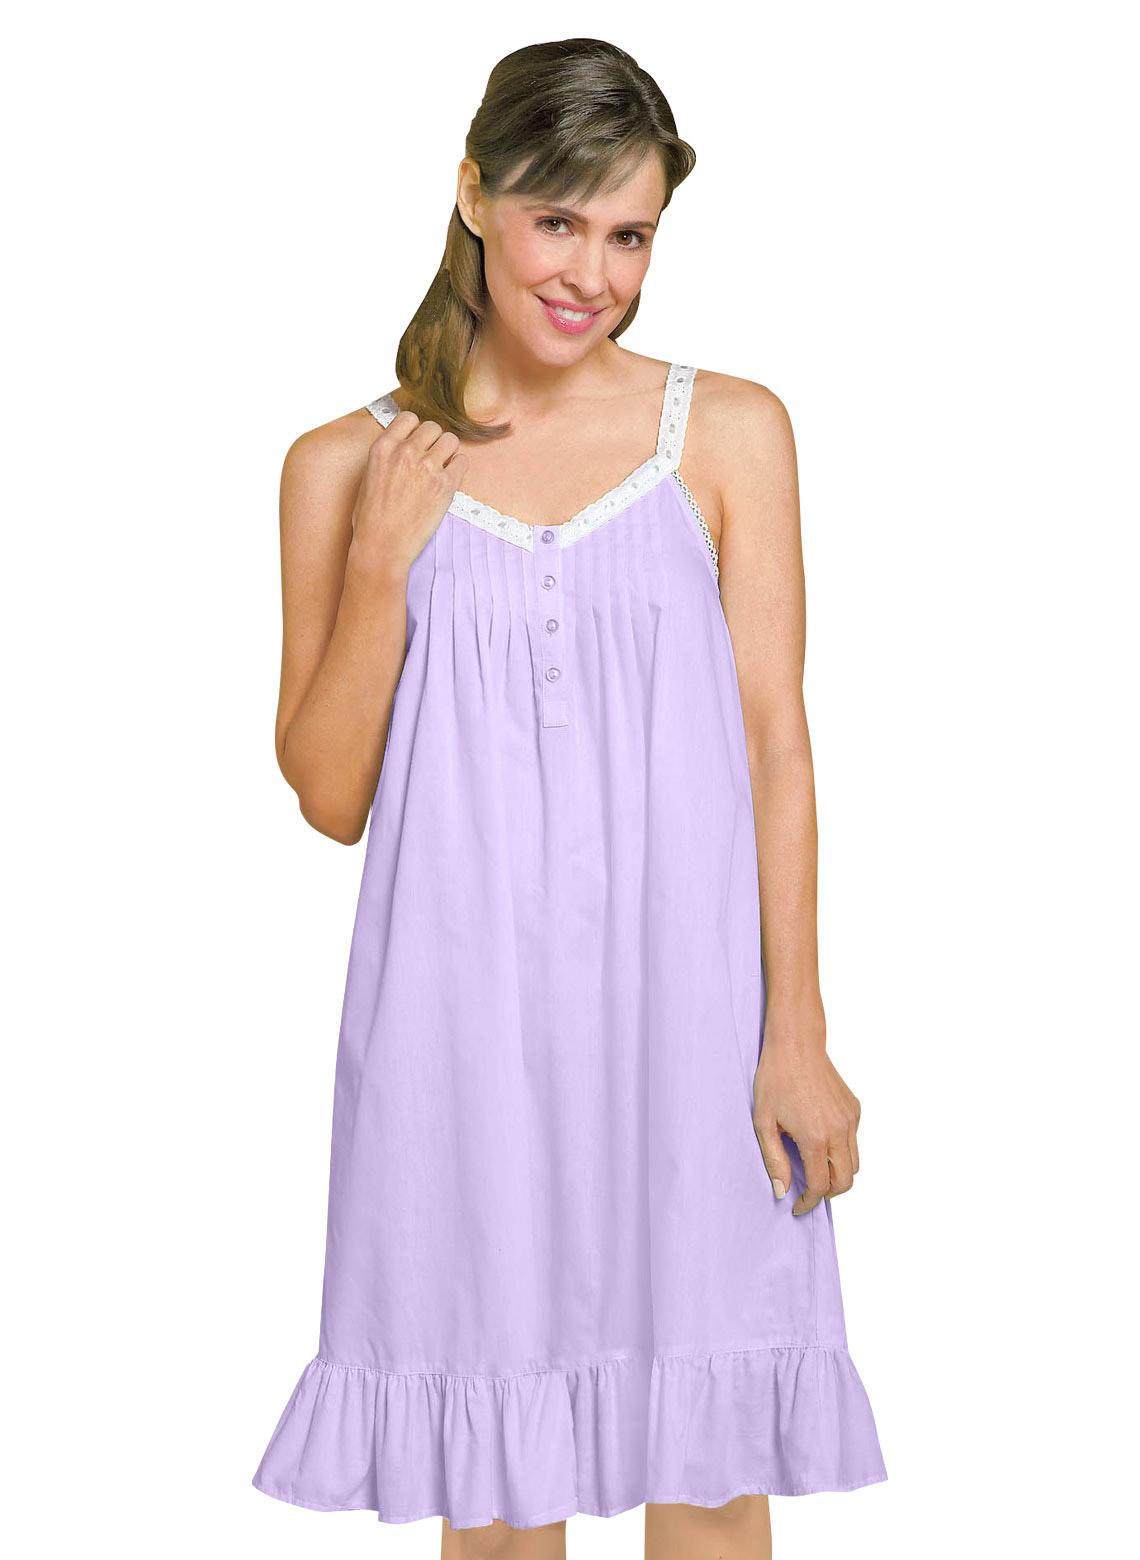 sleeveless nightgown. loading zoom bmkogsr